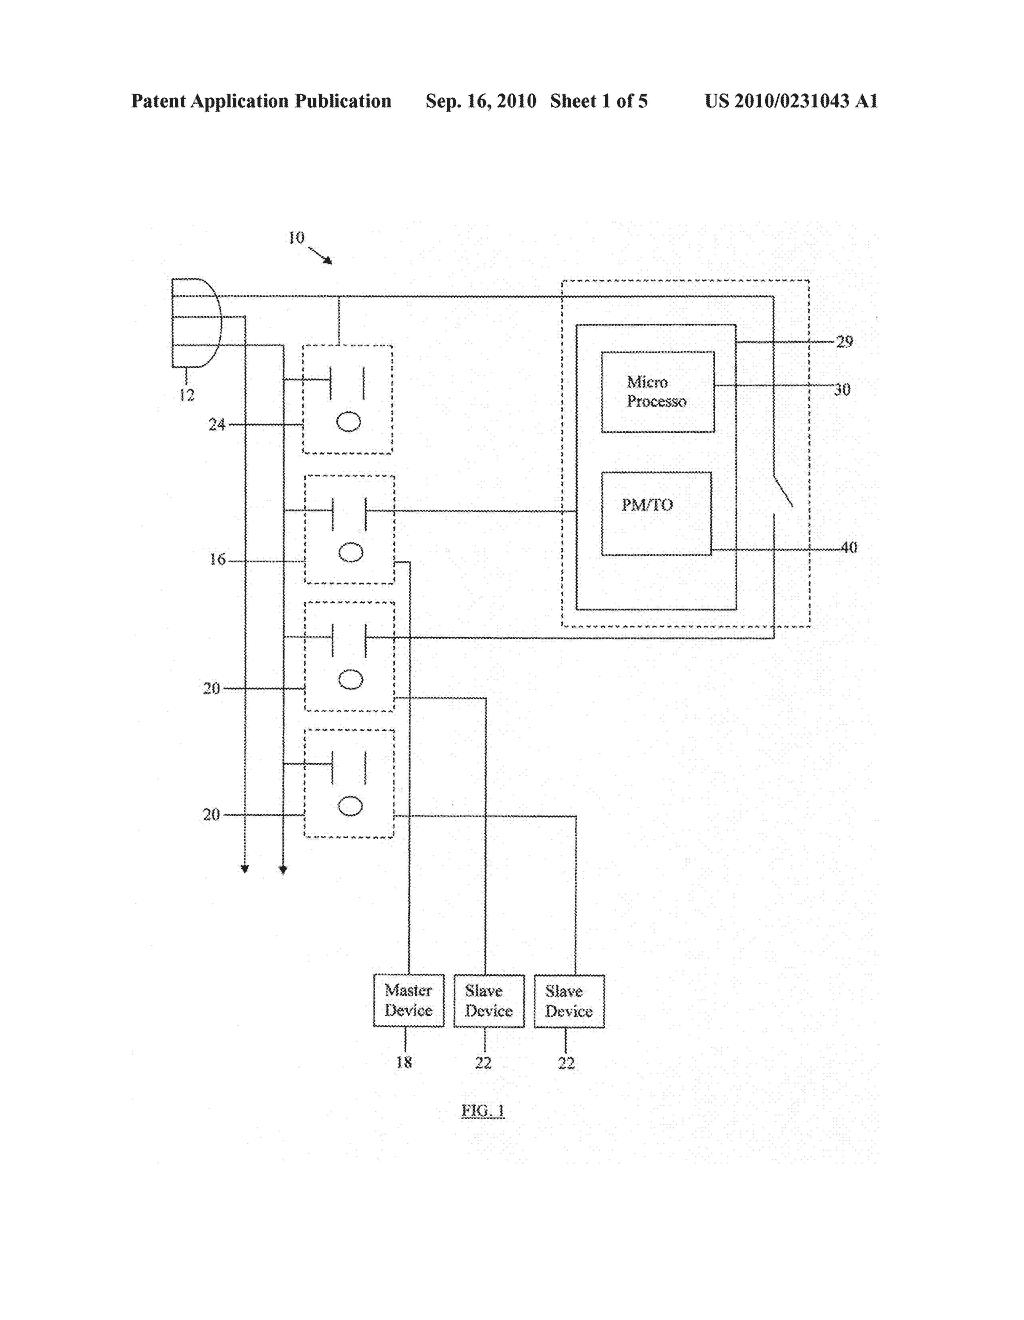 Power Strip Schematic List Of Circuit Diagram 1986 Ford Cl9000 Cl 9000 Big Trucks Wiring Diagrams Schematics Master Slave With Delay Mechanism Rh Patentsencyclopedia Com Breaker Vs Surge